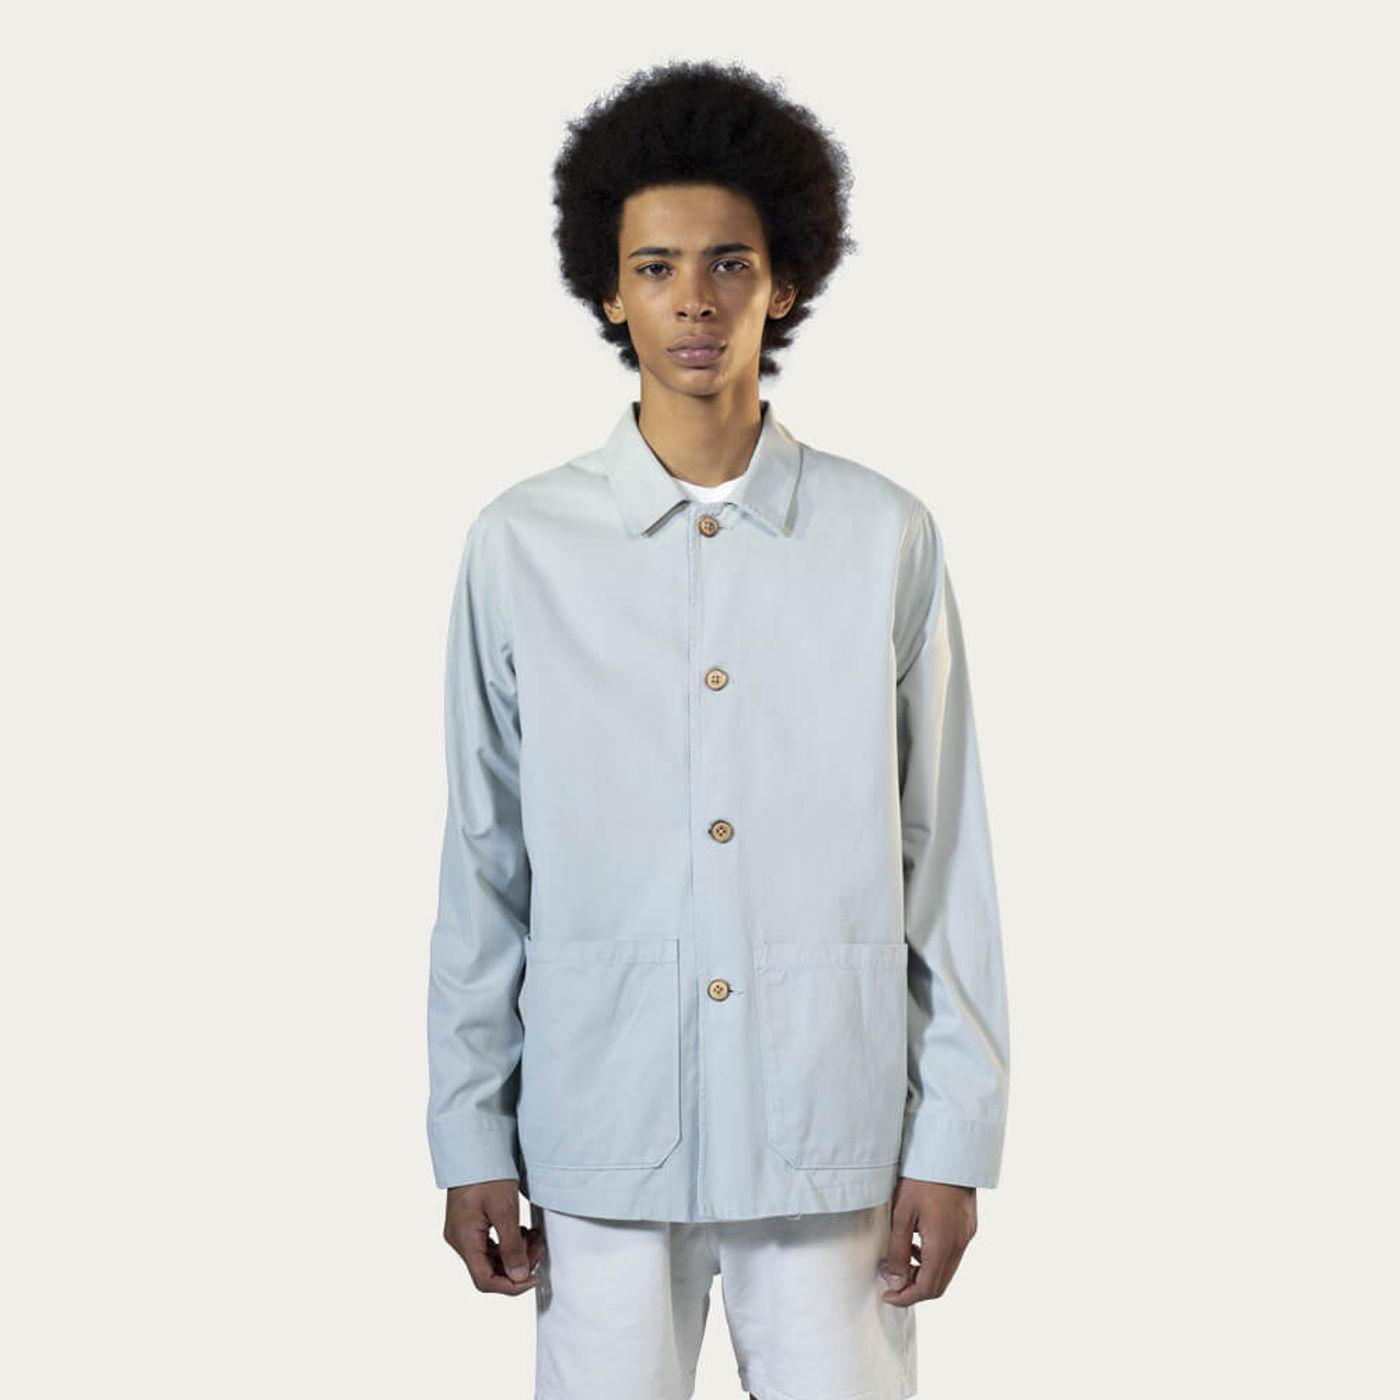 Puritan Grey Cotton Work Jacket | Bombinate